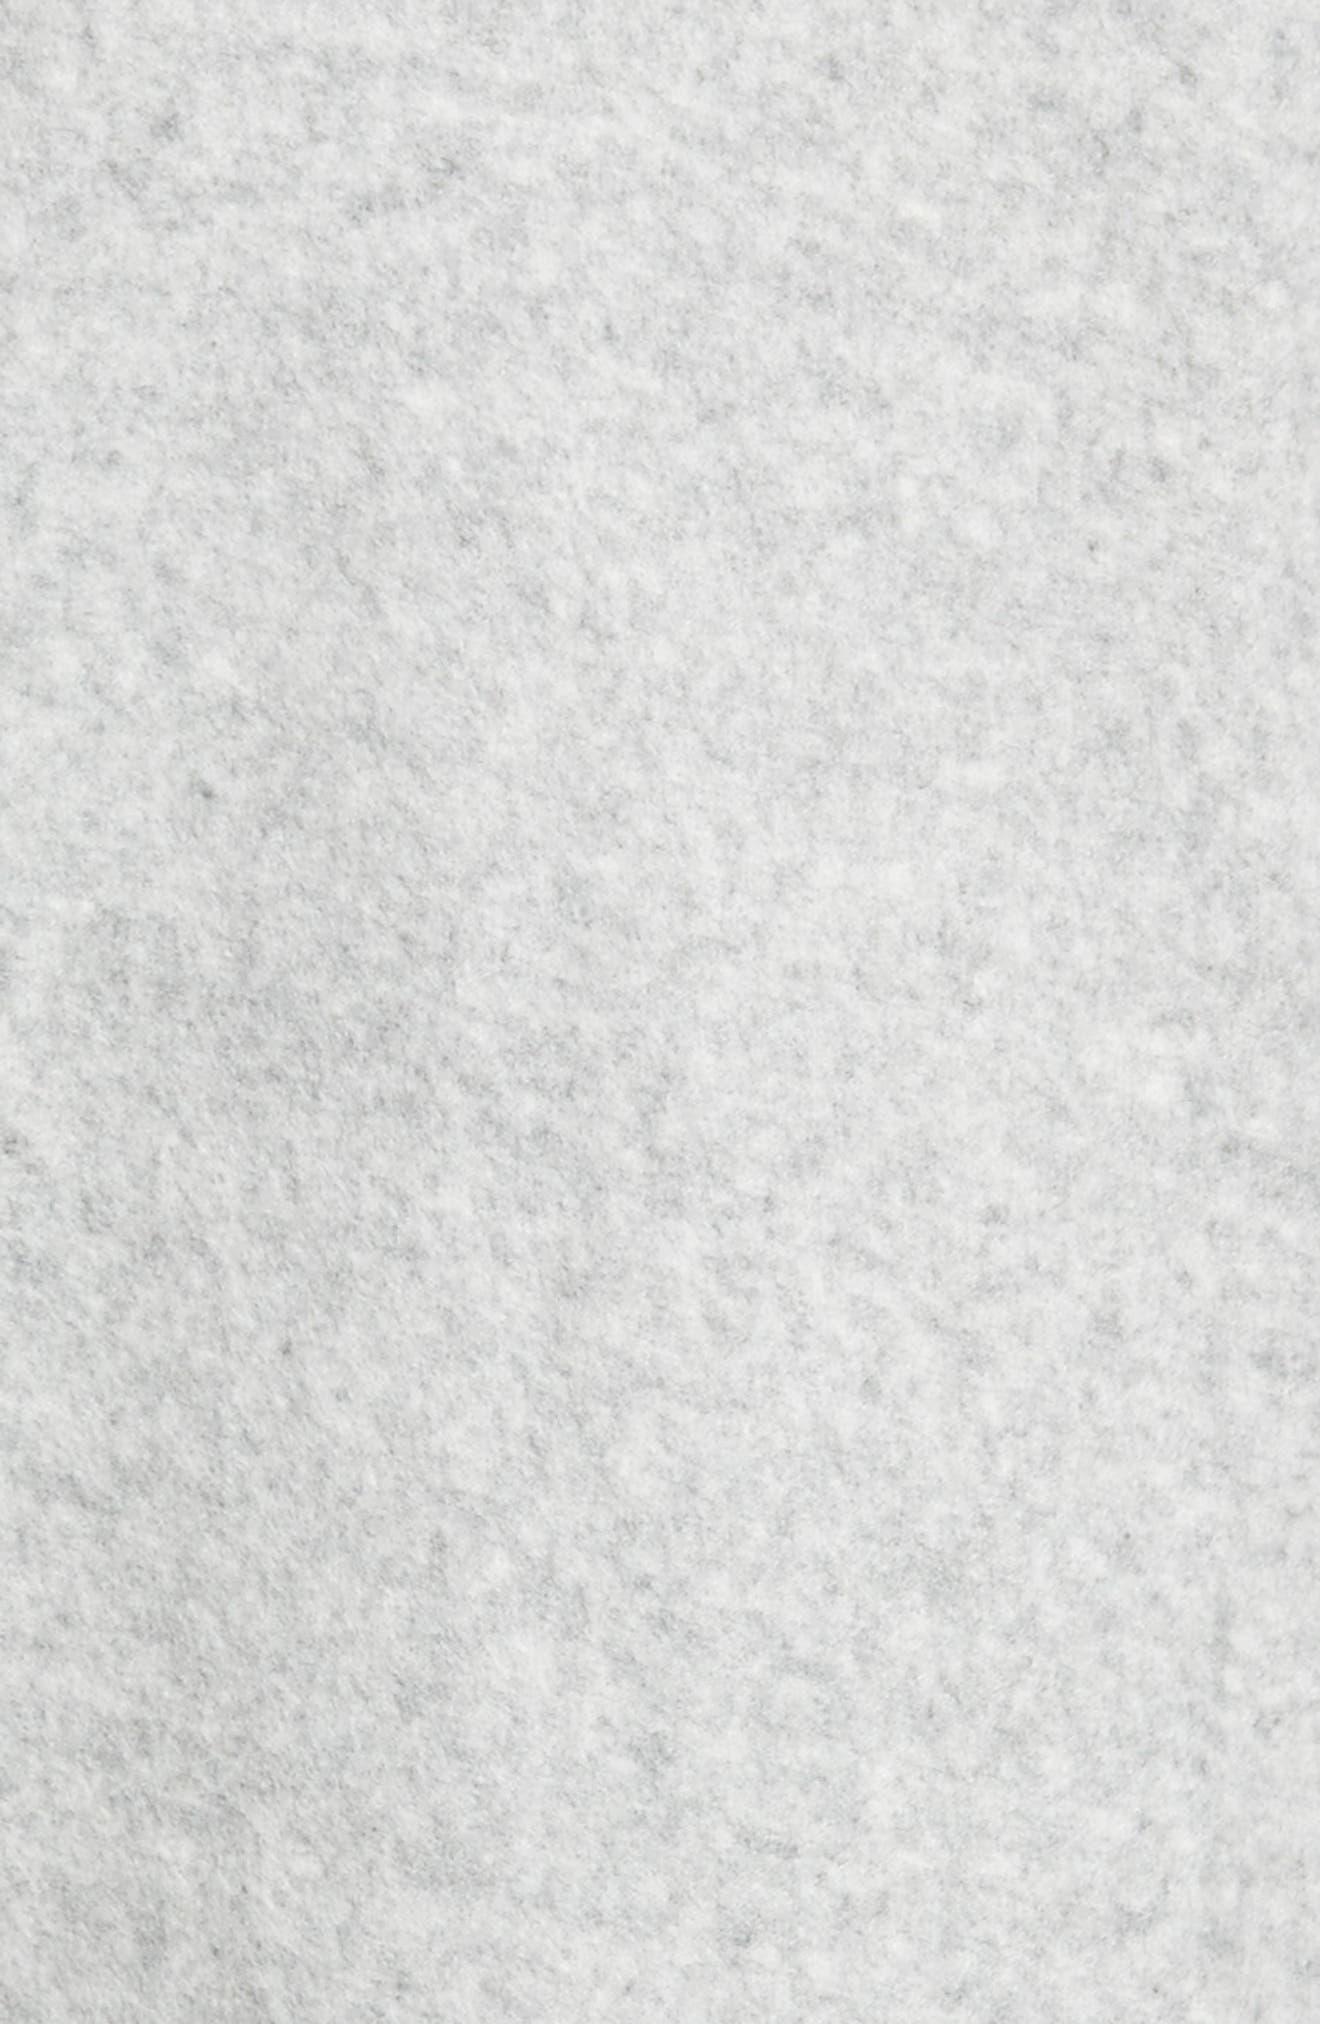 Bell Sleeve Sweatshirt,                             Alternate thumbnail 5, color,                             Grey Heather